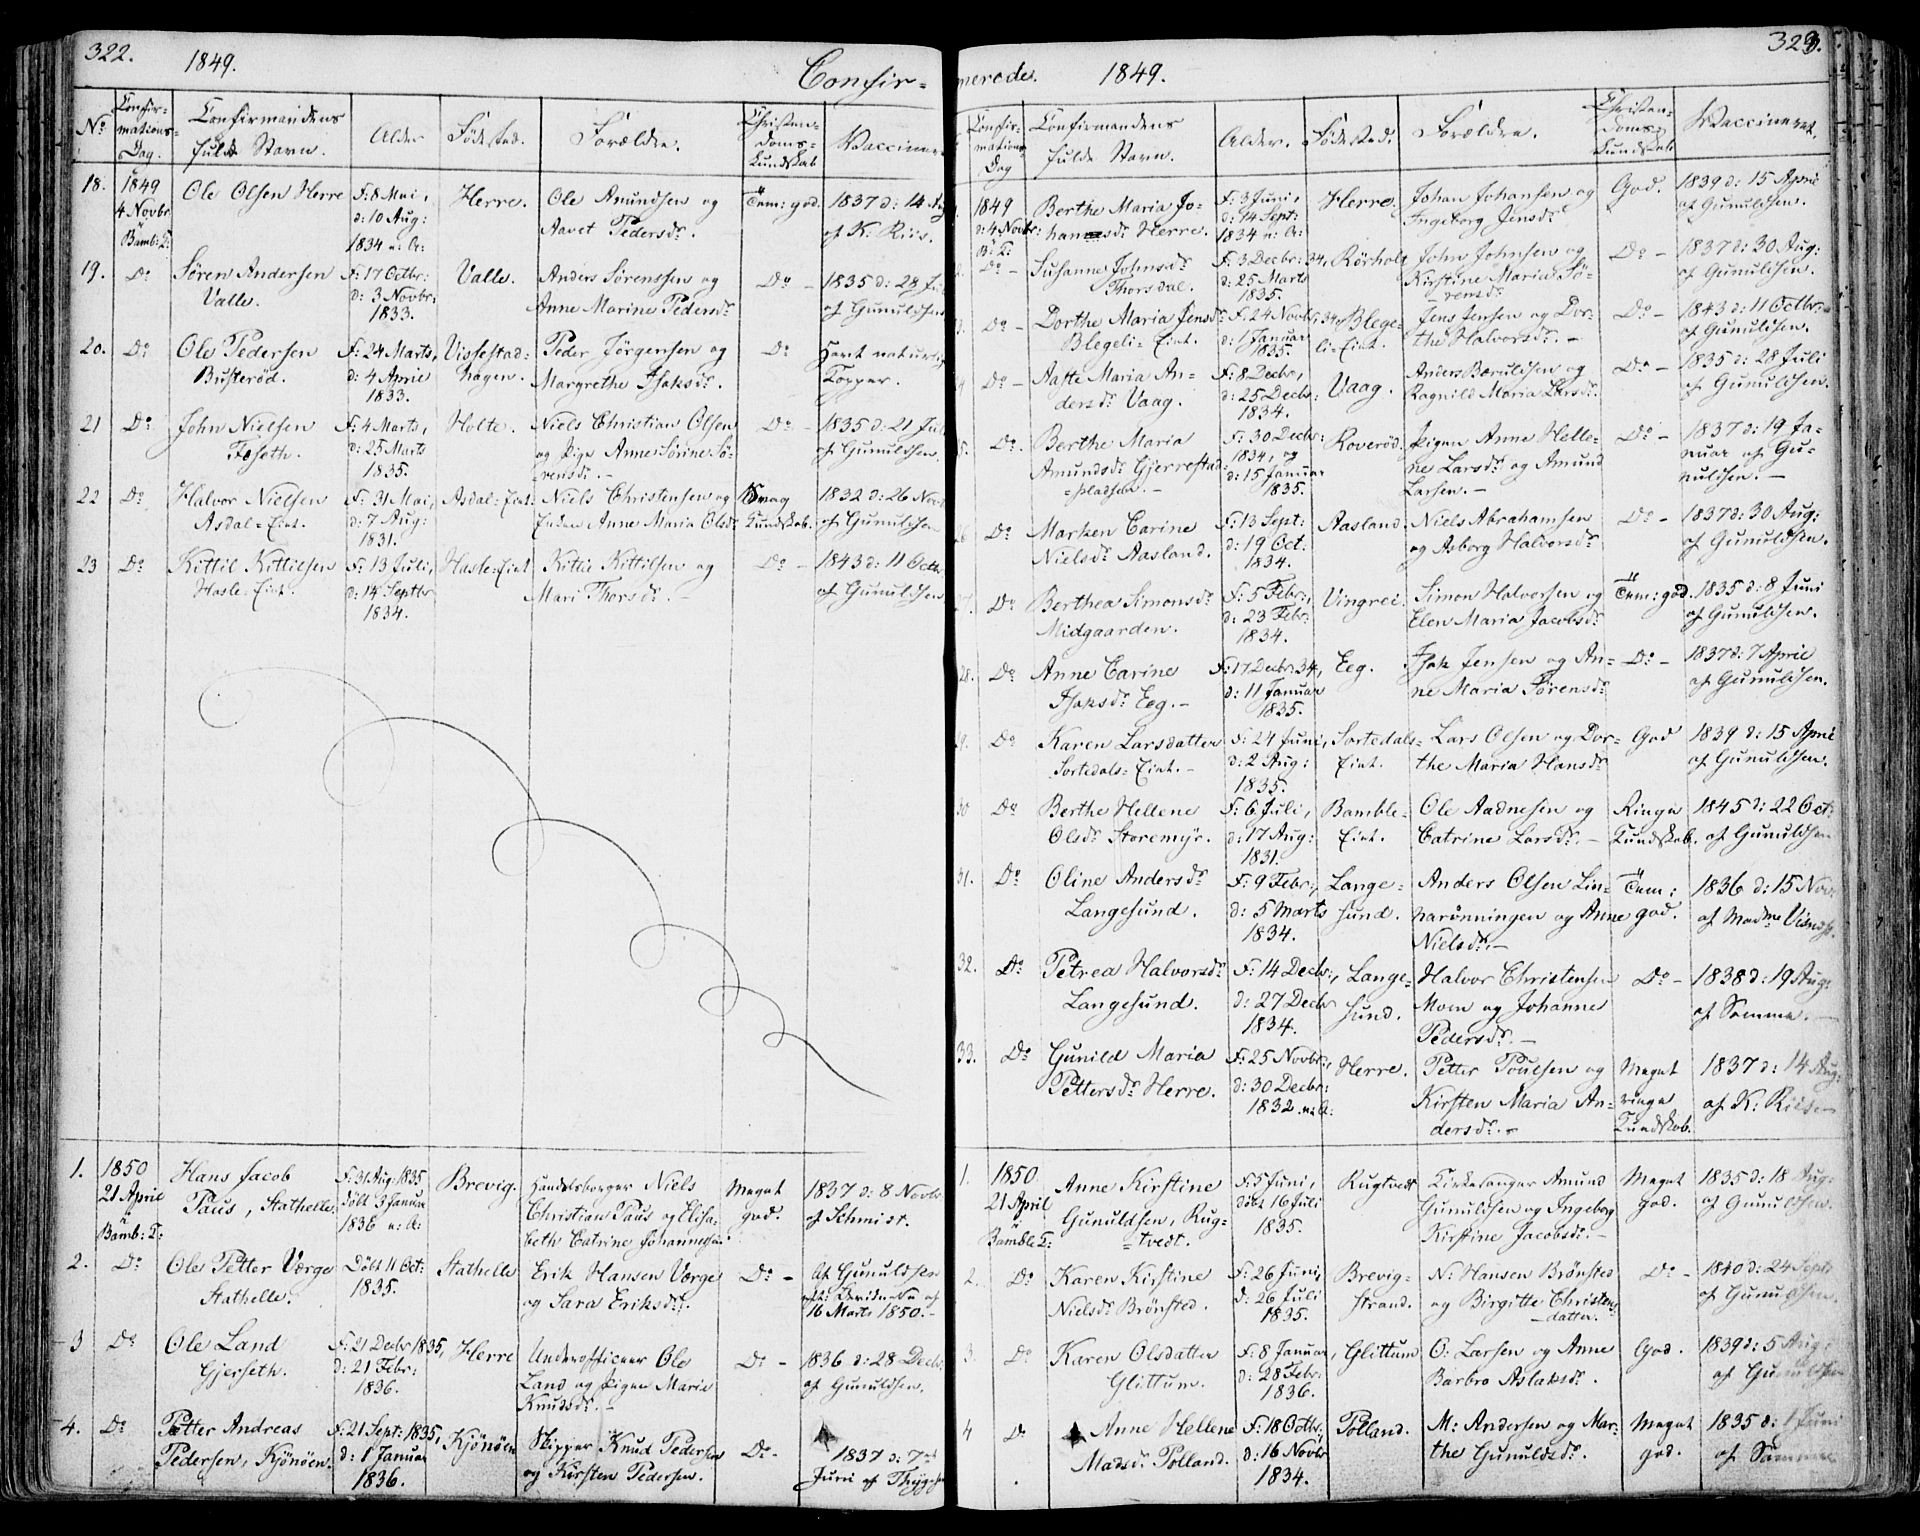 SAKO, Bamble kirkebøker, F/Fa/L0004: Ministerialbok nr. I 4, 1834-1853, s. 322-323